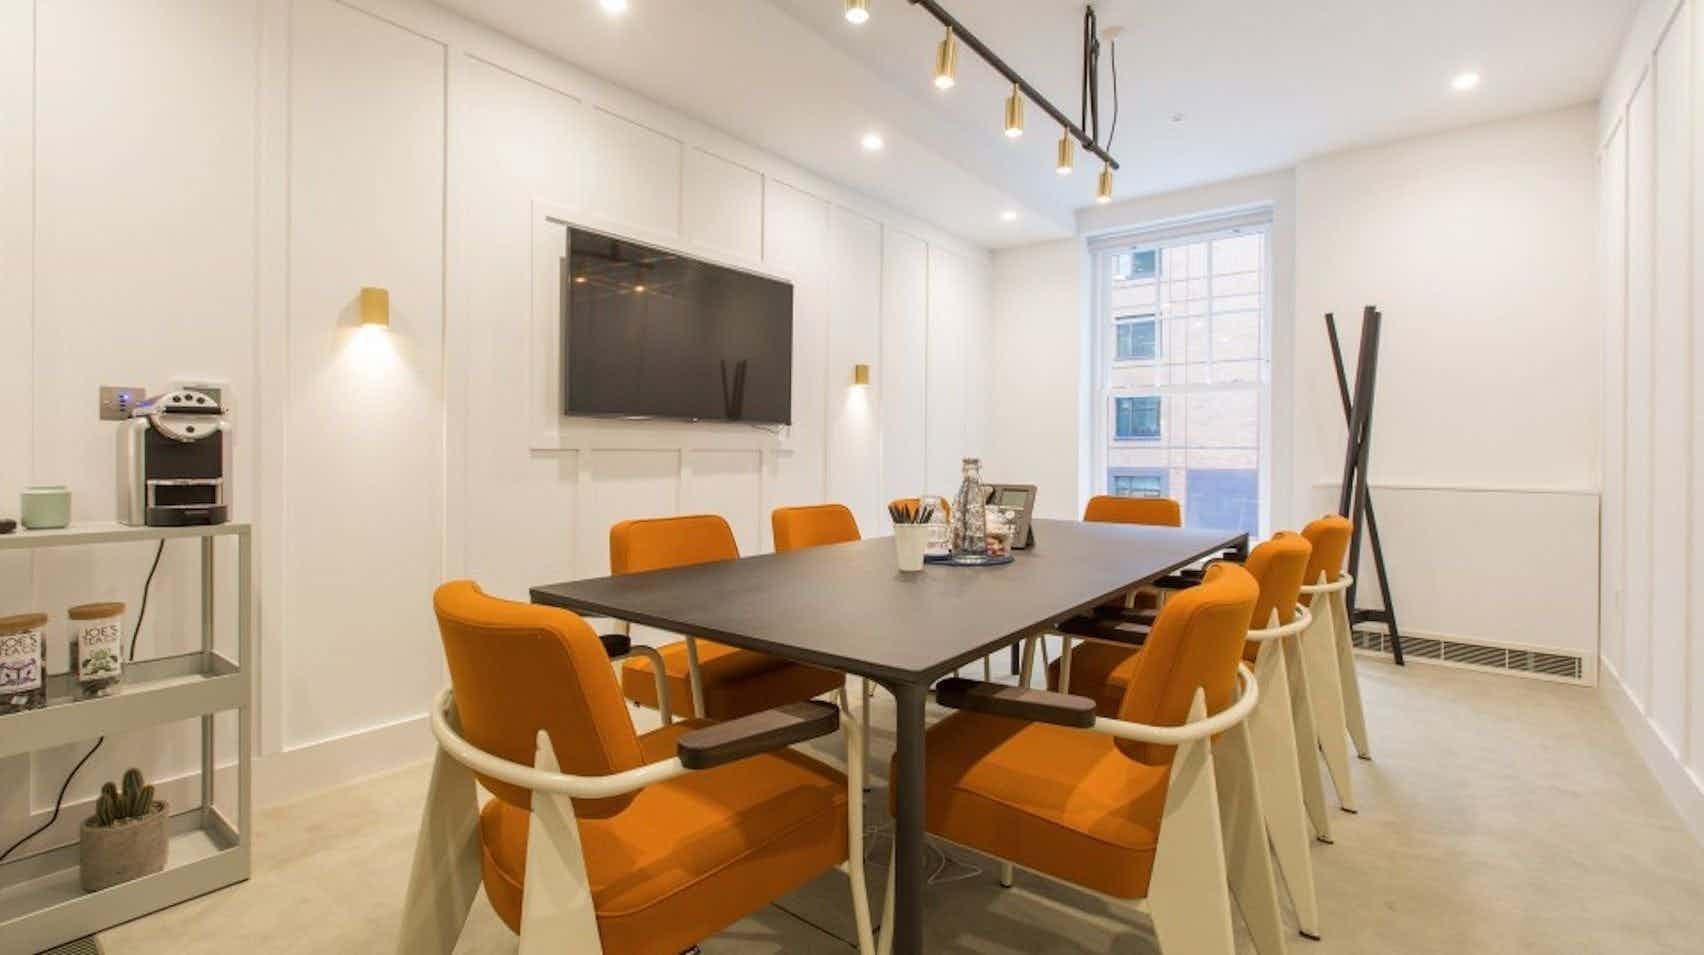 Meeting Room 5, TOG, 91 Wimpole Street